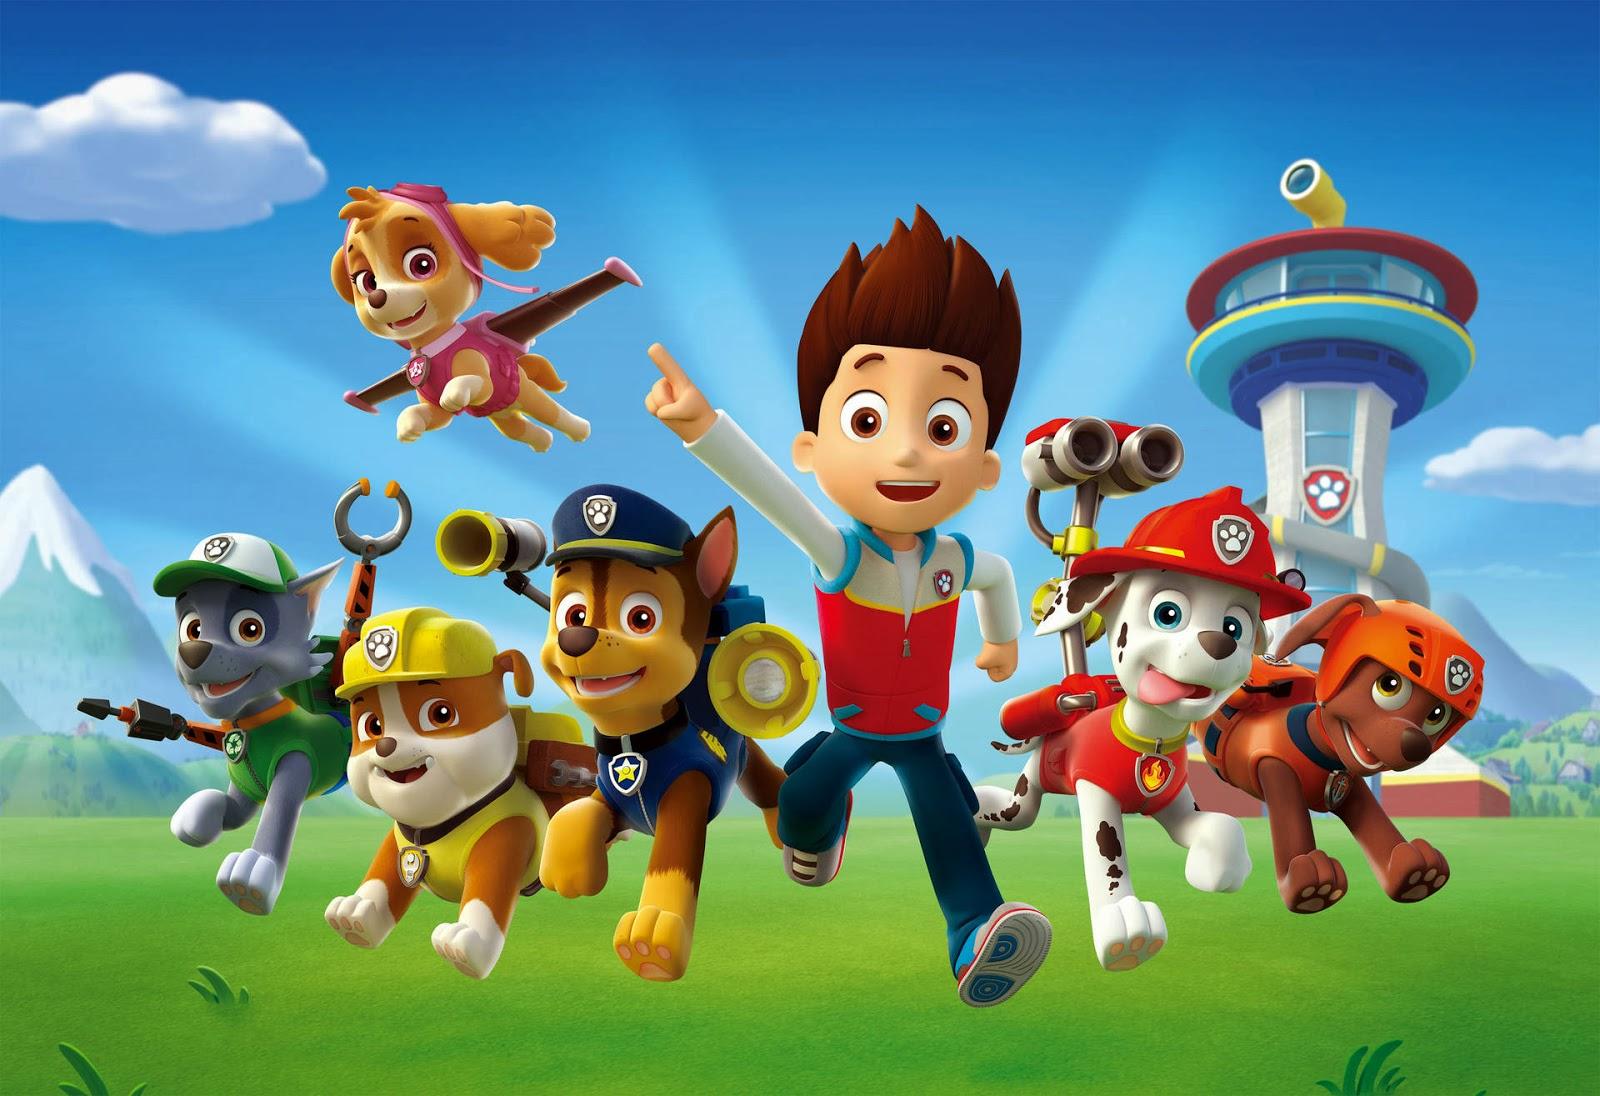 paw-patrol-characters-cast-stars-nickelodeon-preschool-nick-jr-junior-chase-marshall-rocky-rubble-zuma-skye-ryder-germany-deutschland-press.jpg